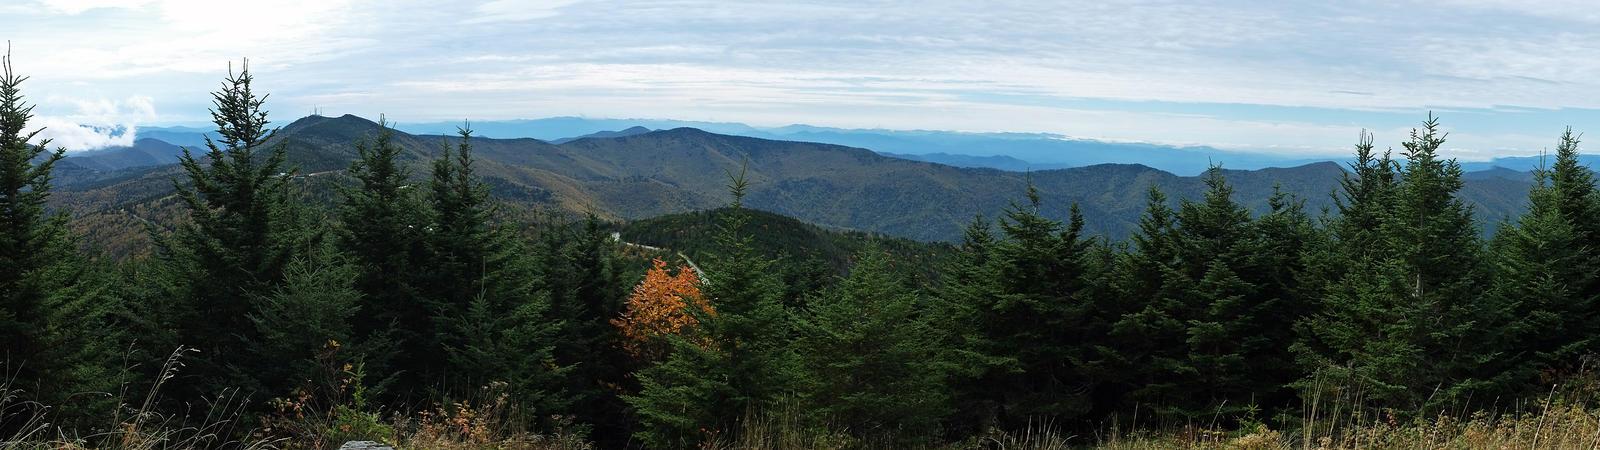 Mt. Mitchell Summit Panorama 1